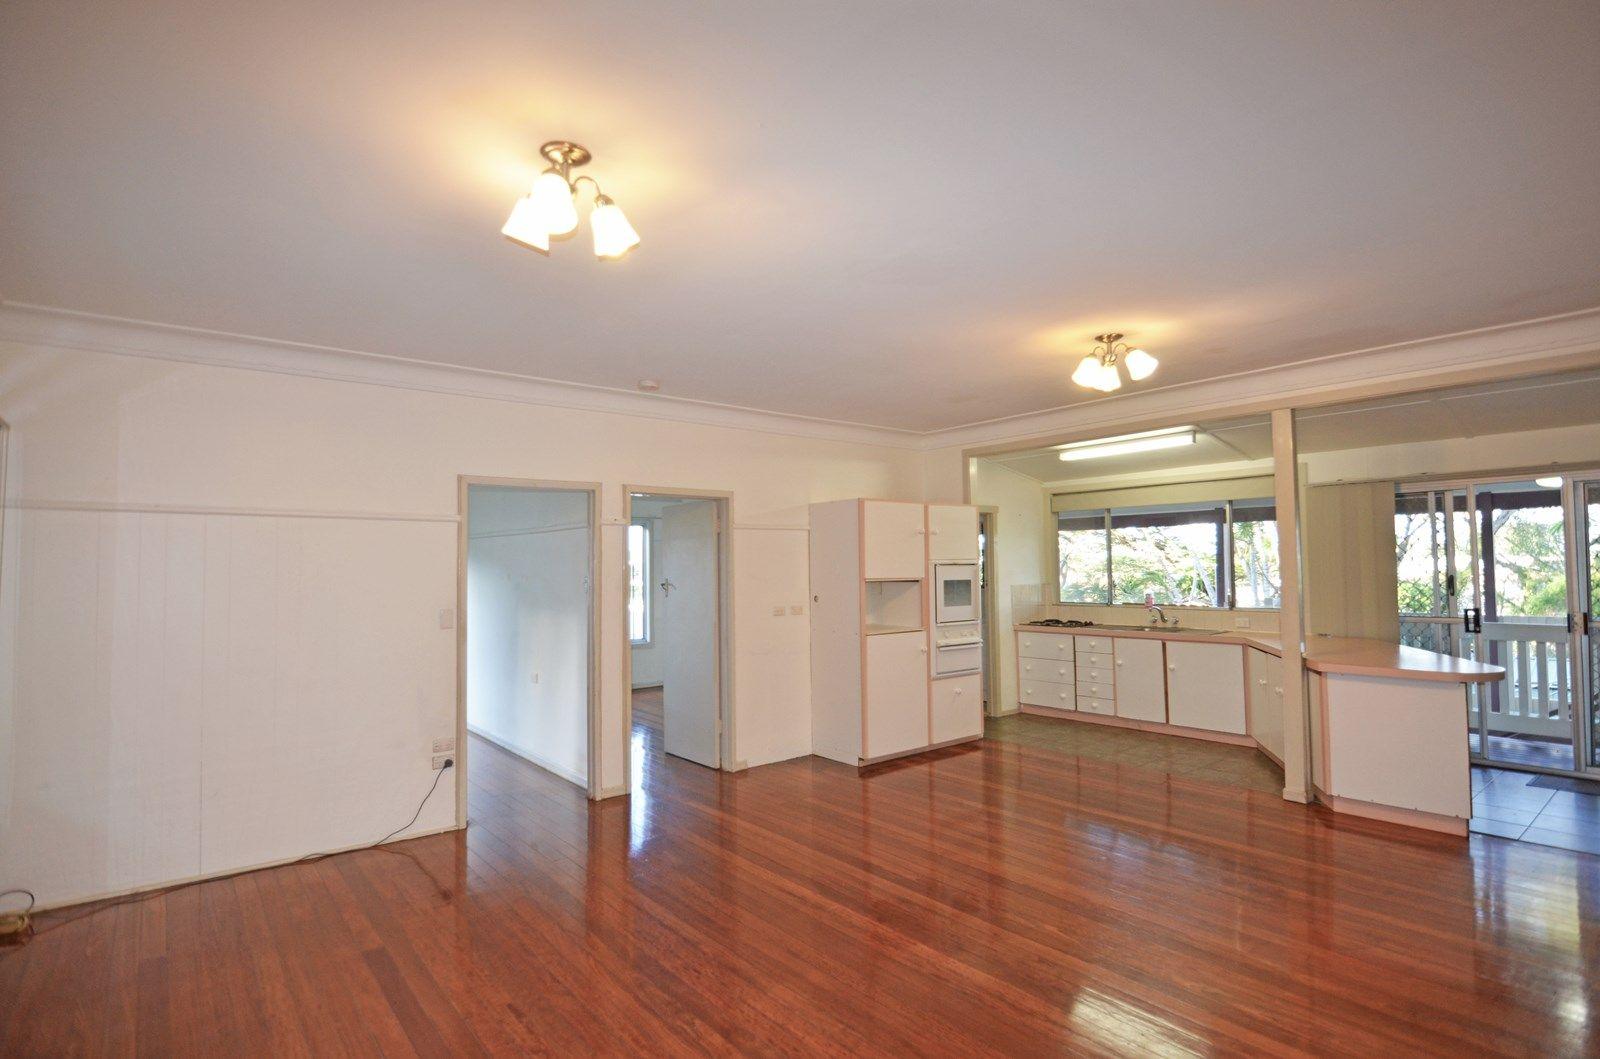 52 Adelaide, Tweed Heads NSW 2485, Image 1